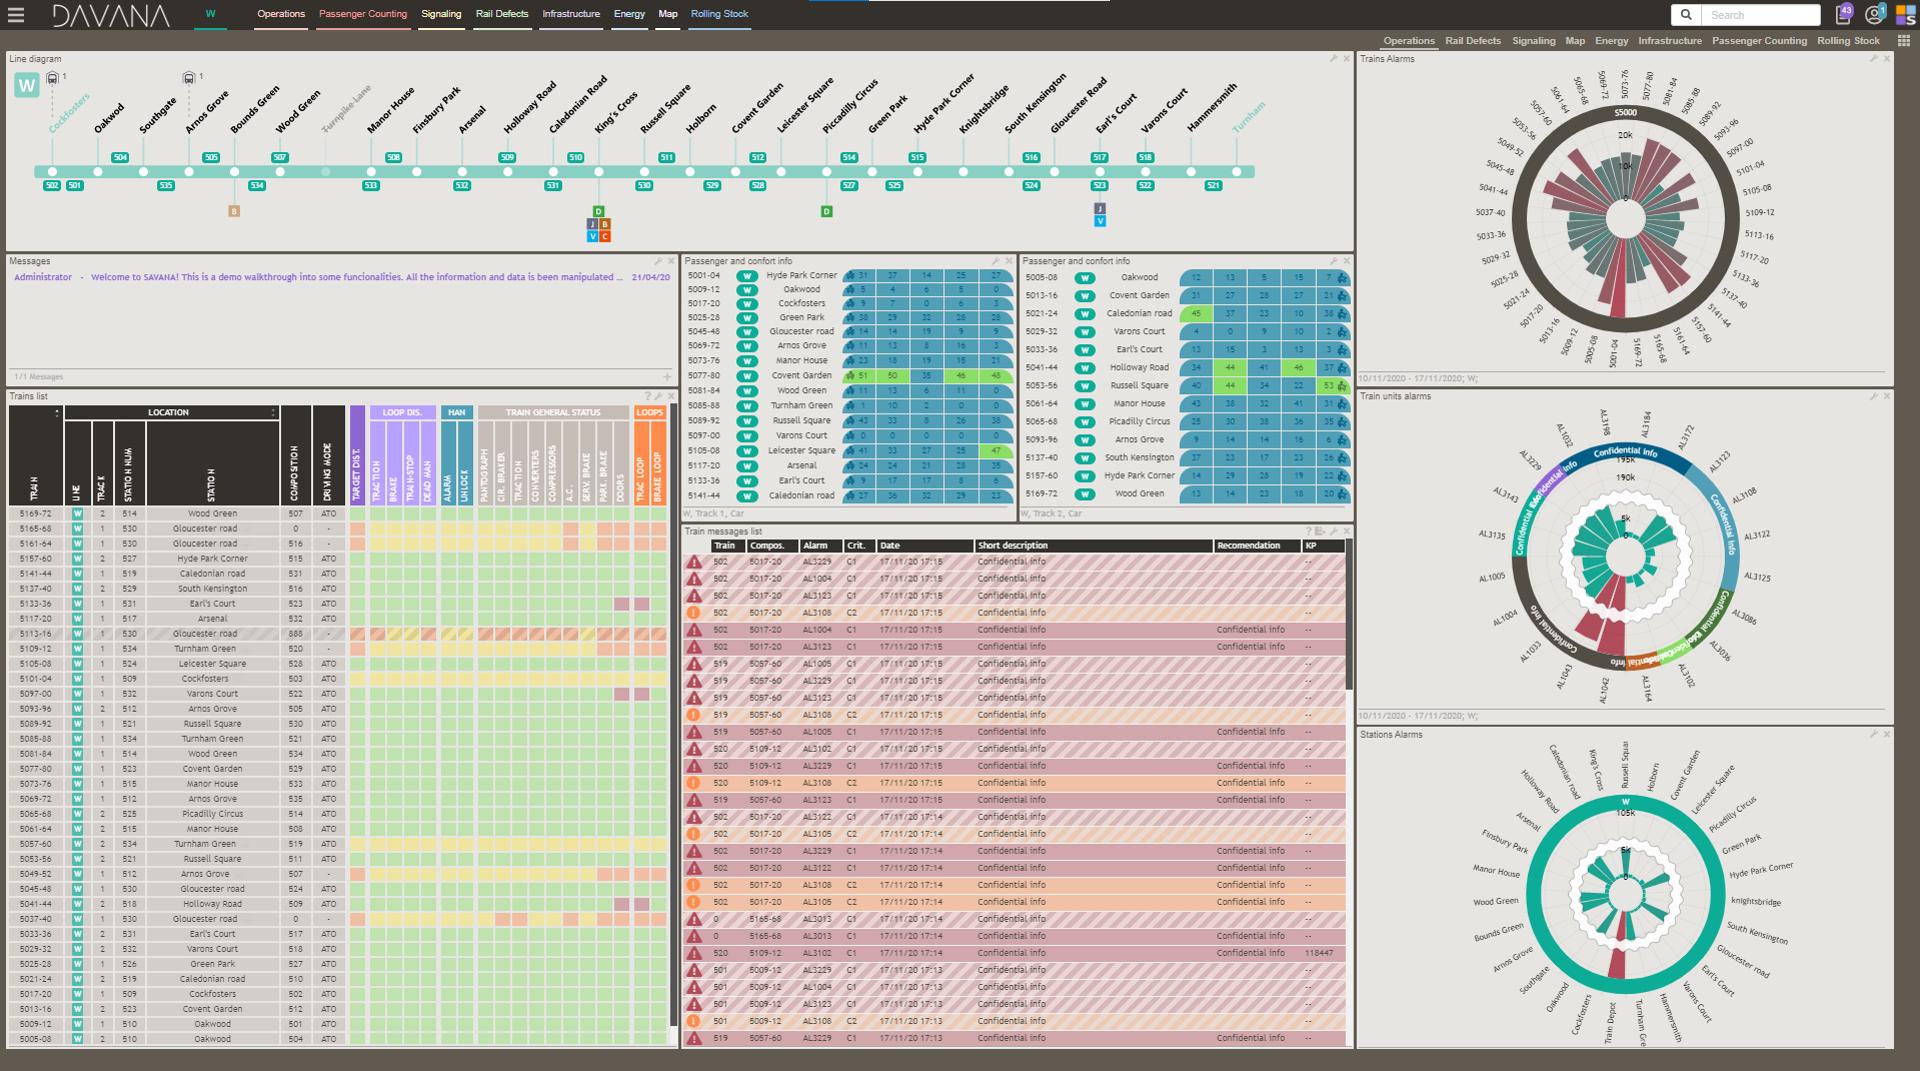 Network Overview_DAVANA-1